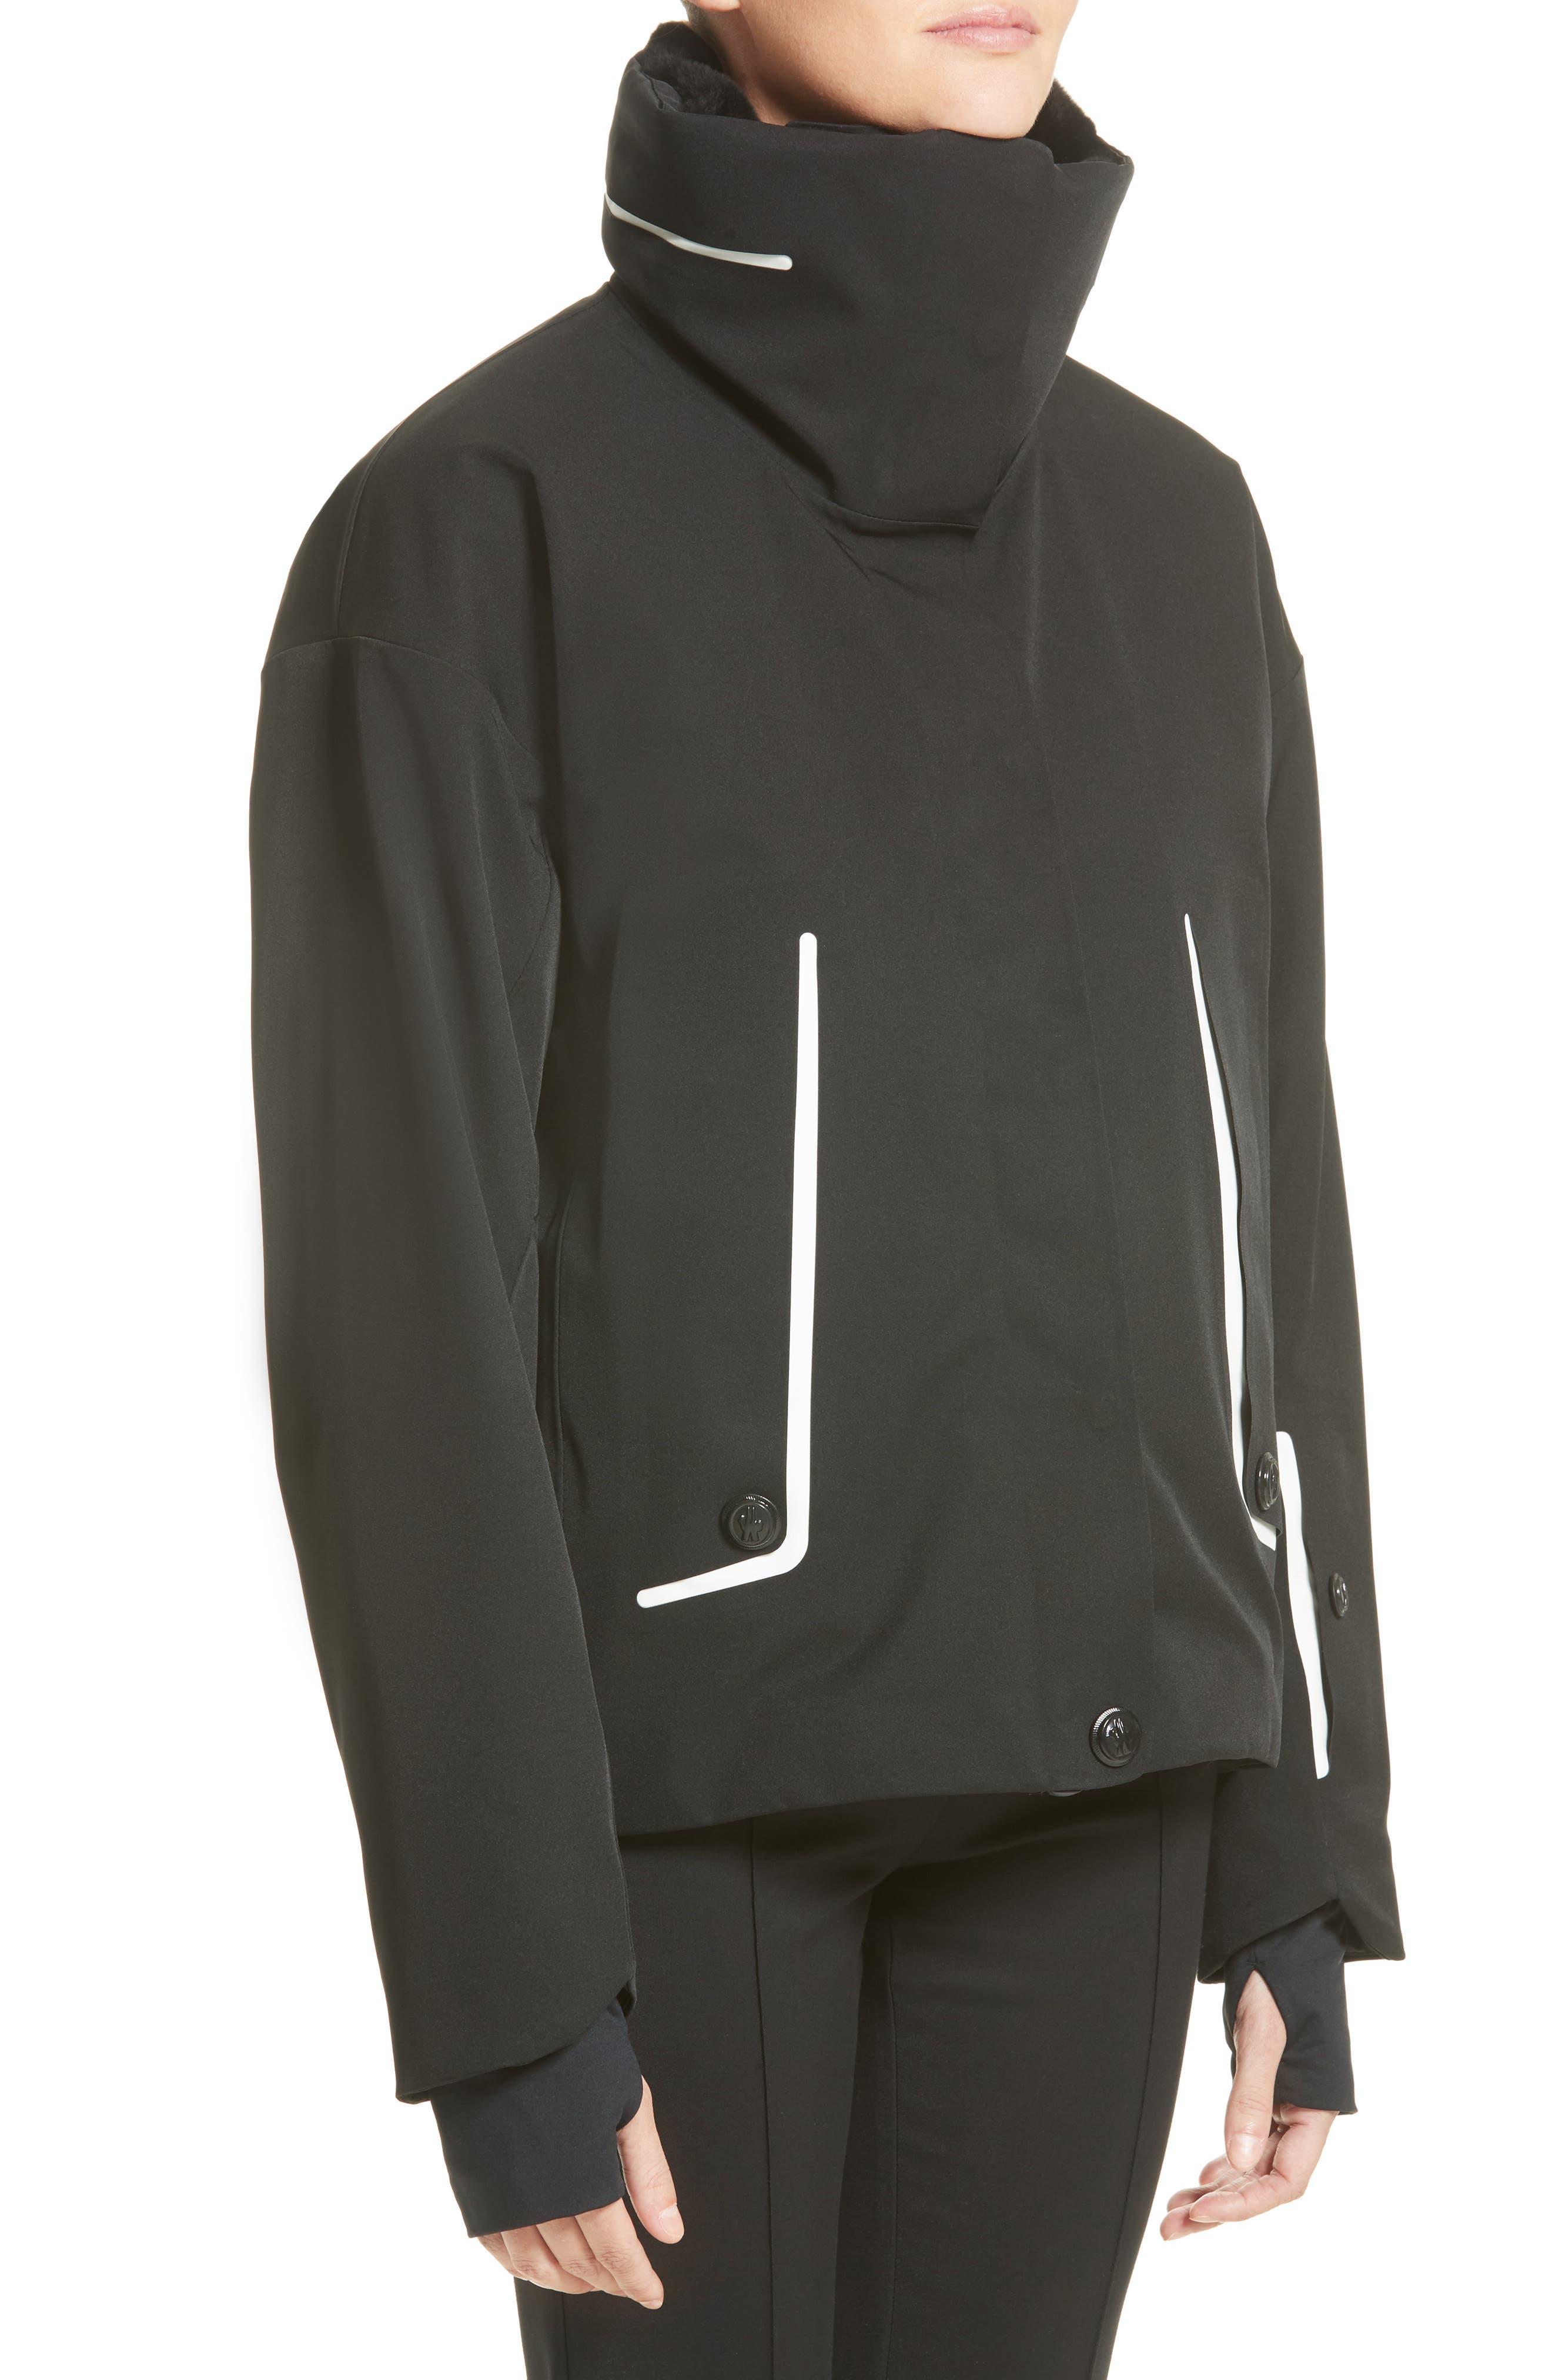 Troisvallees Jacket with Genuine Nutria Fur Collar,                             Alternate thumbnail 4, color,                             Black/ White